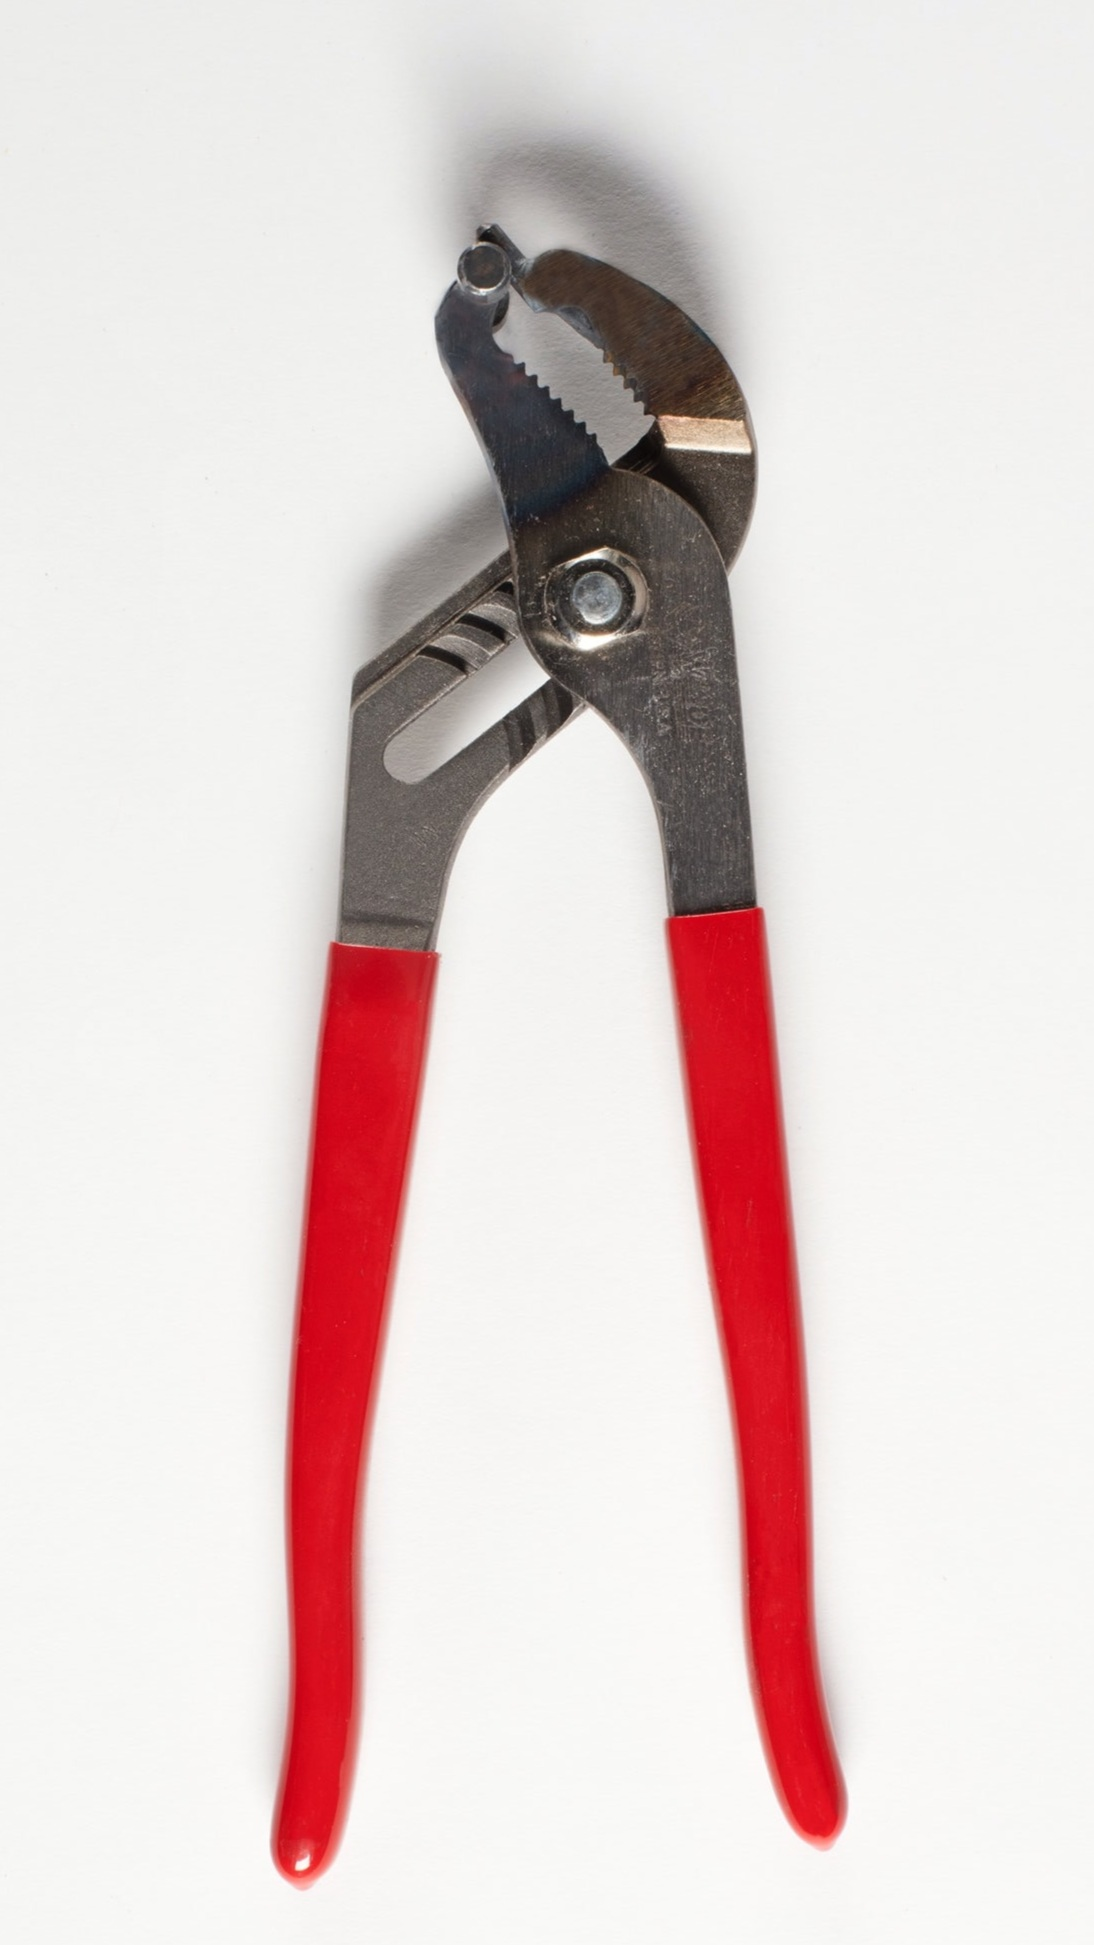 Vampire Hanger Tool